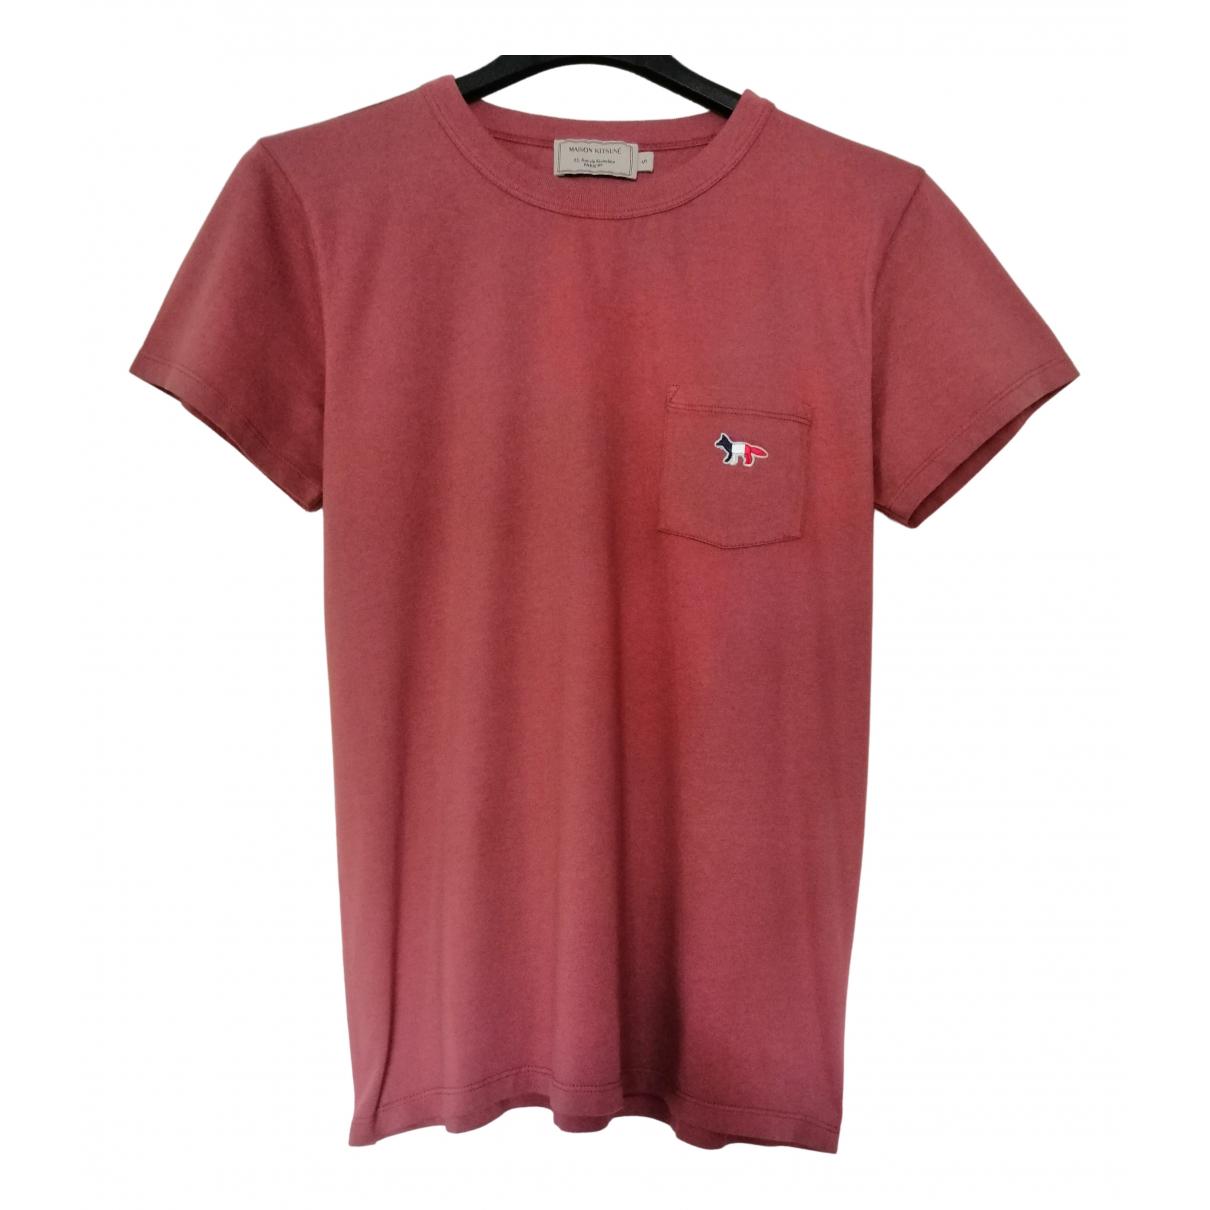 Maison Kitsune \N Red Cotton  top for Women S International